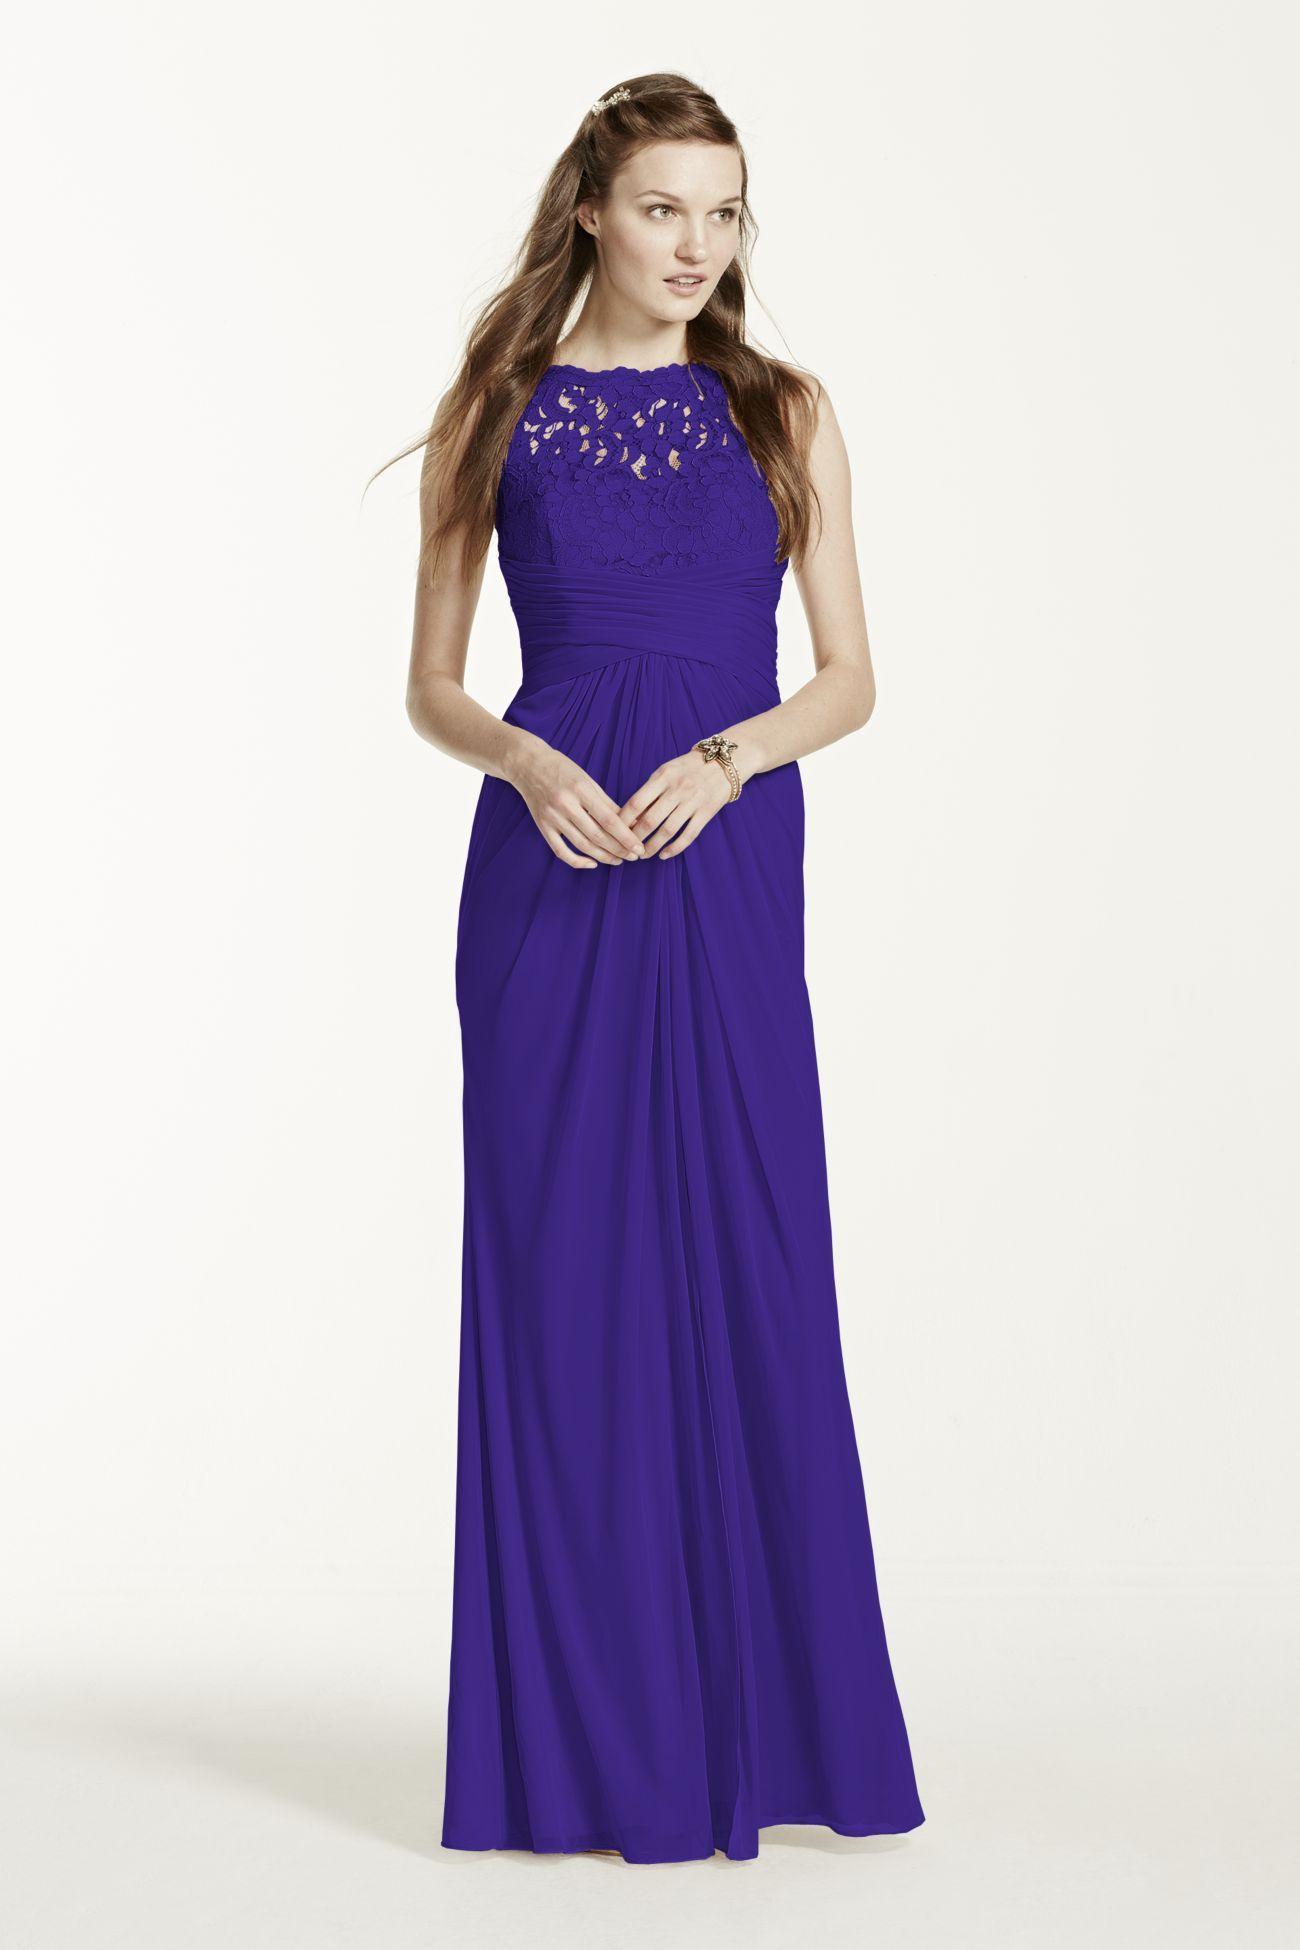 My New Favorite! www.davidsbridal.com/10237112 | Bridesmaids | Pinterest